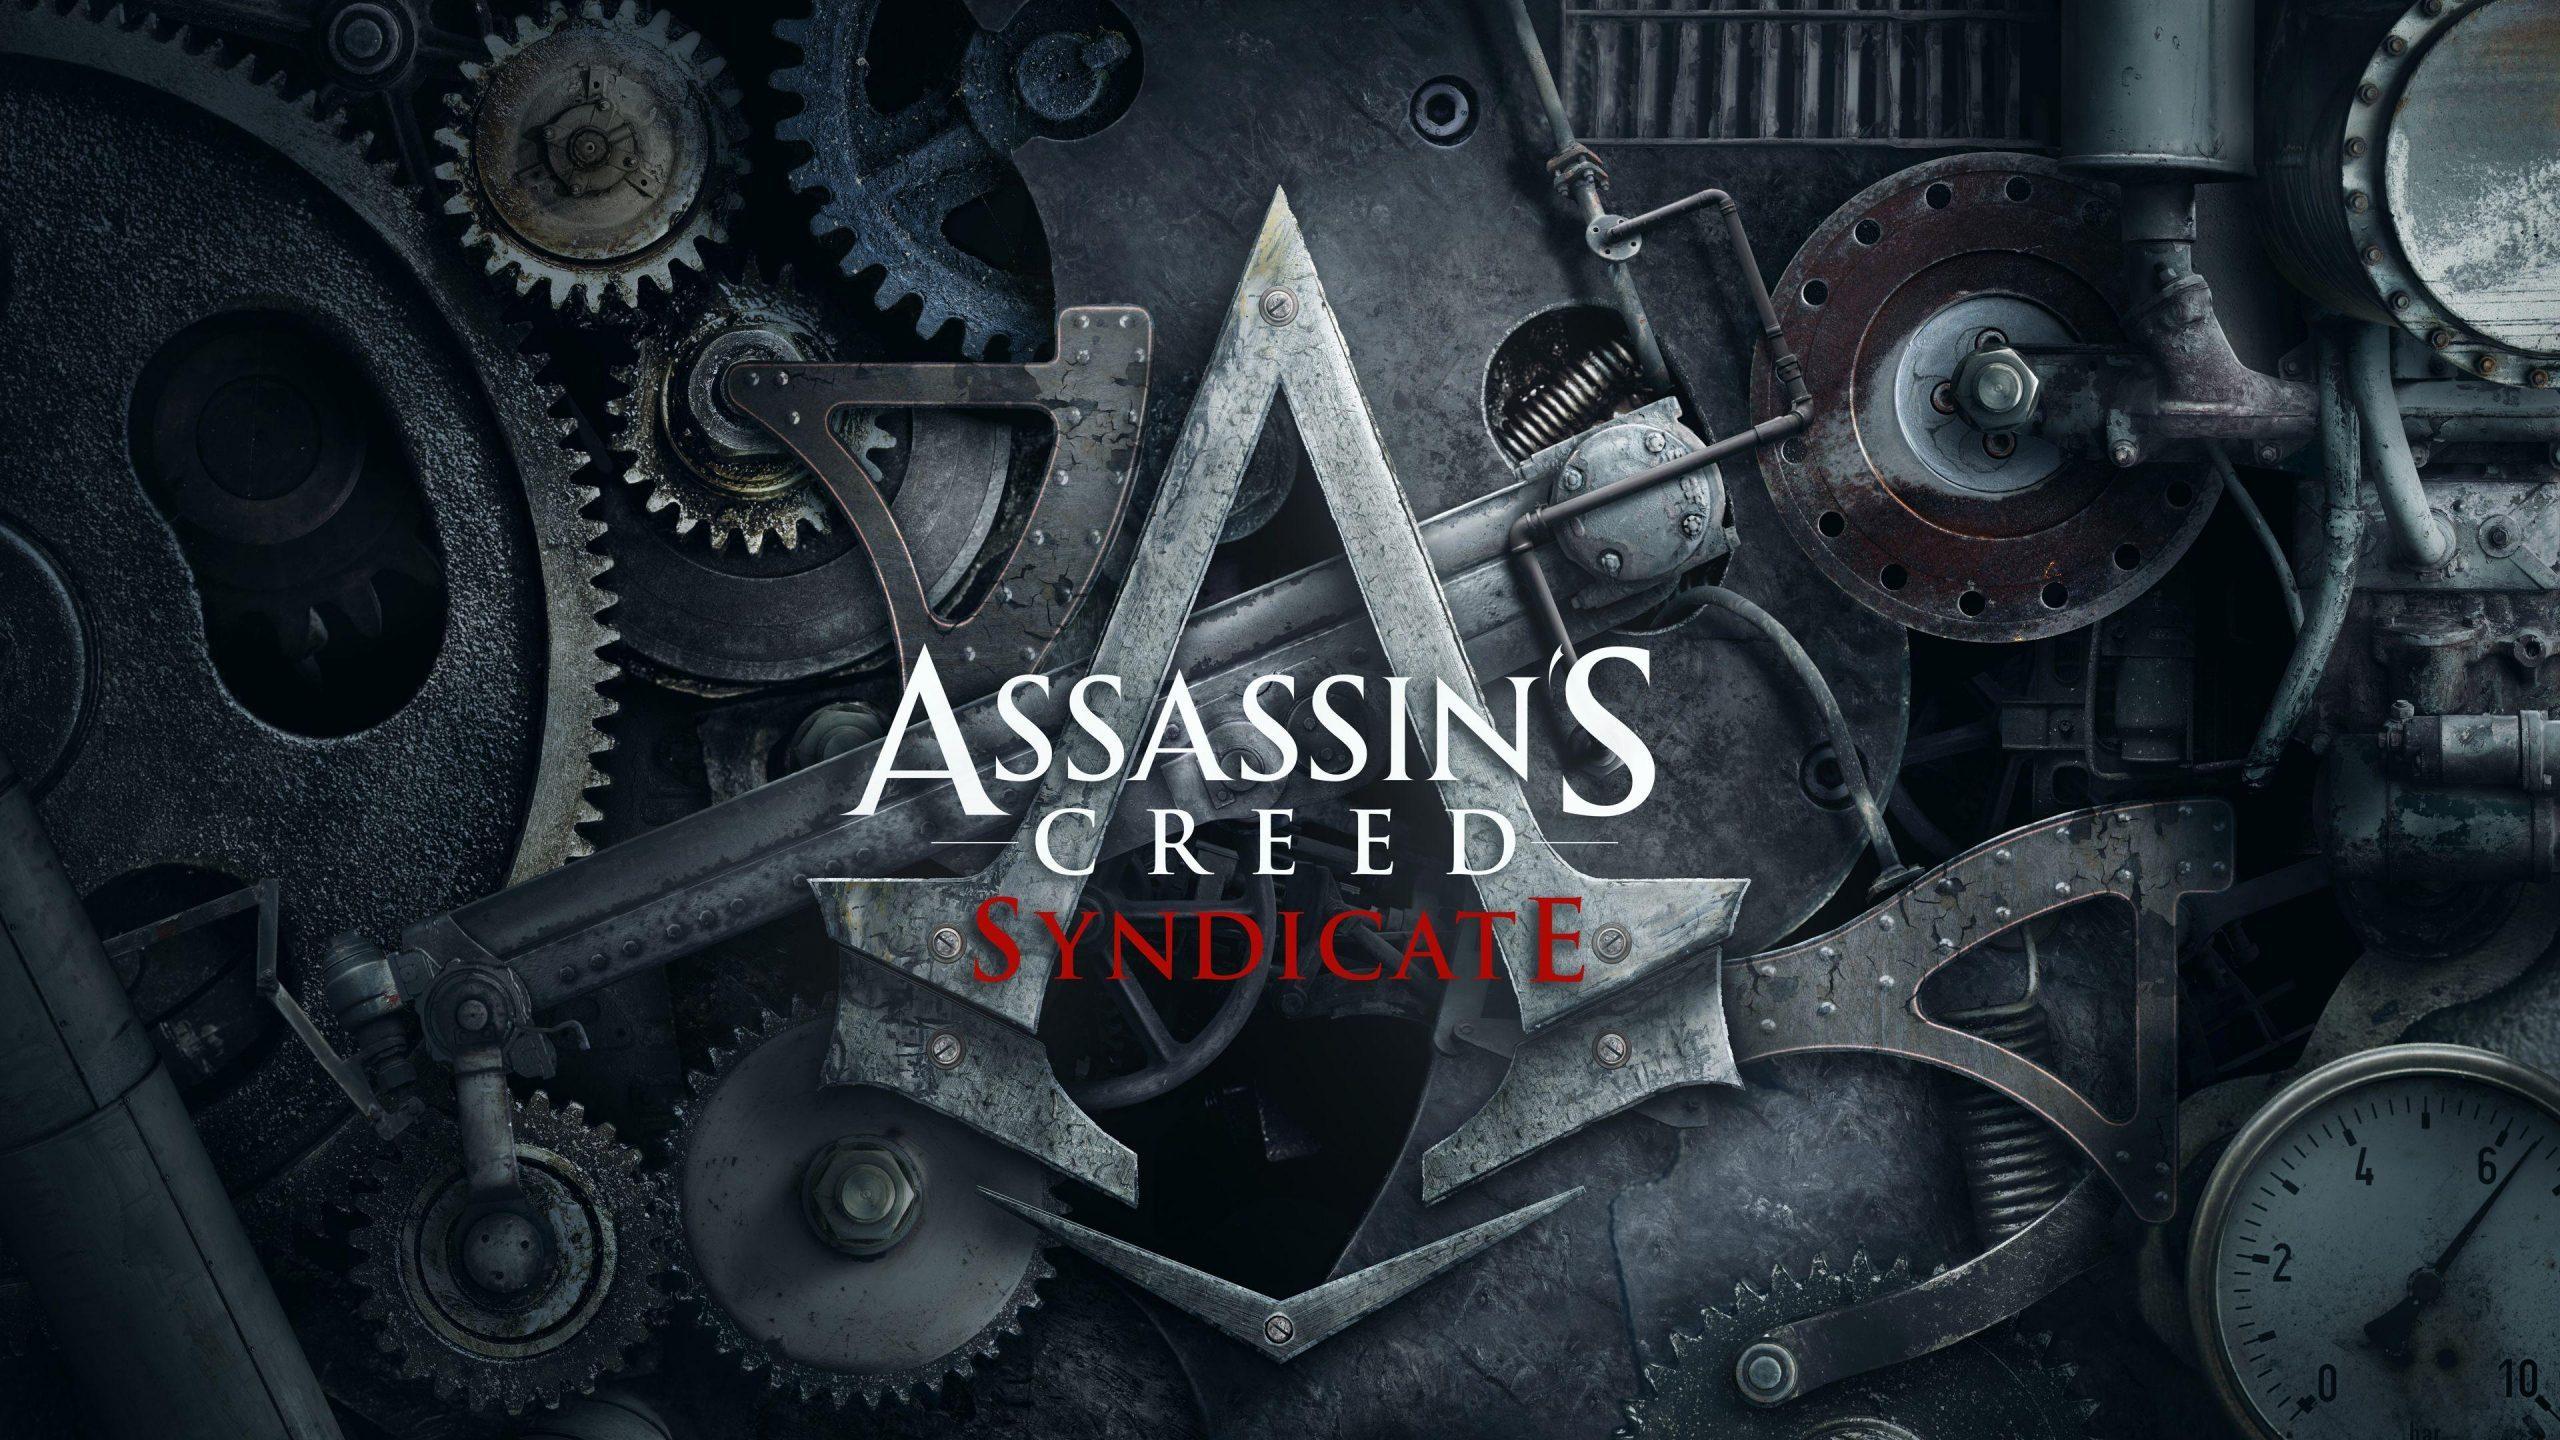 بازی Assassins Creed Syndicate